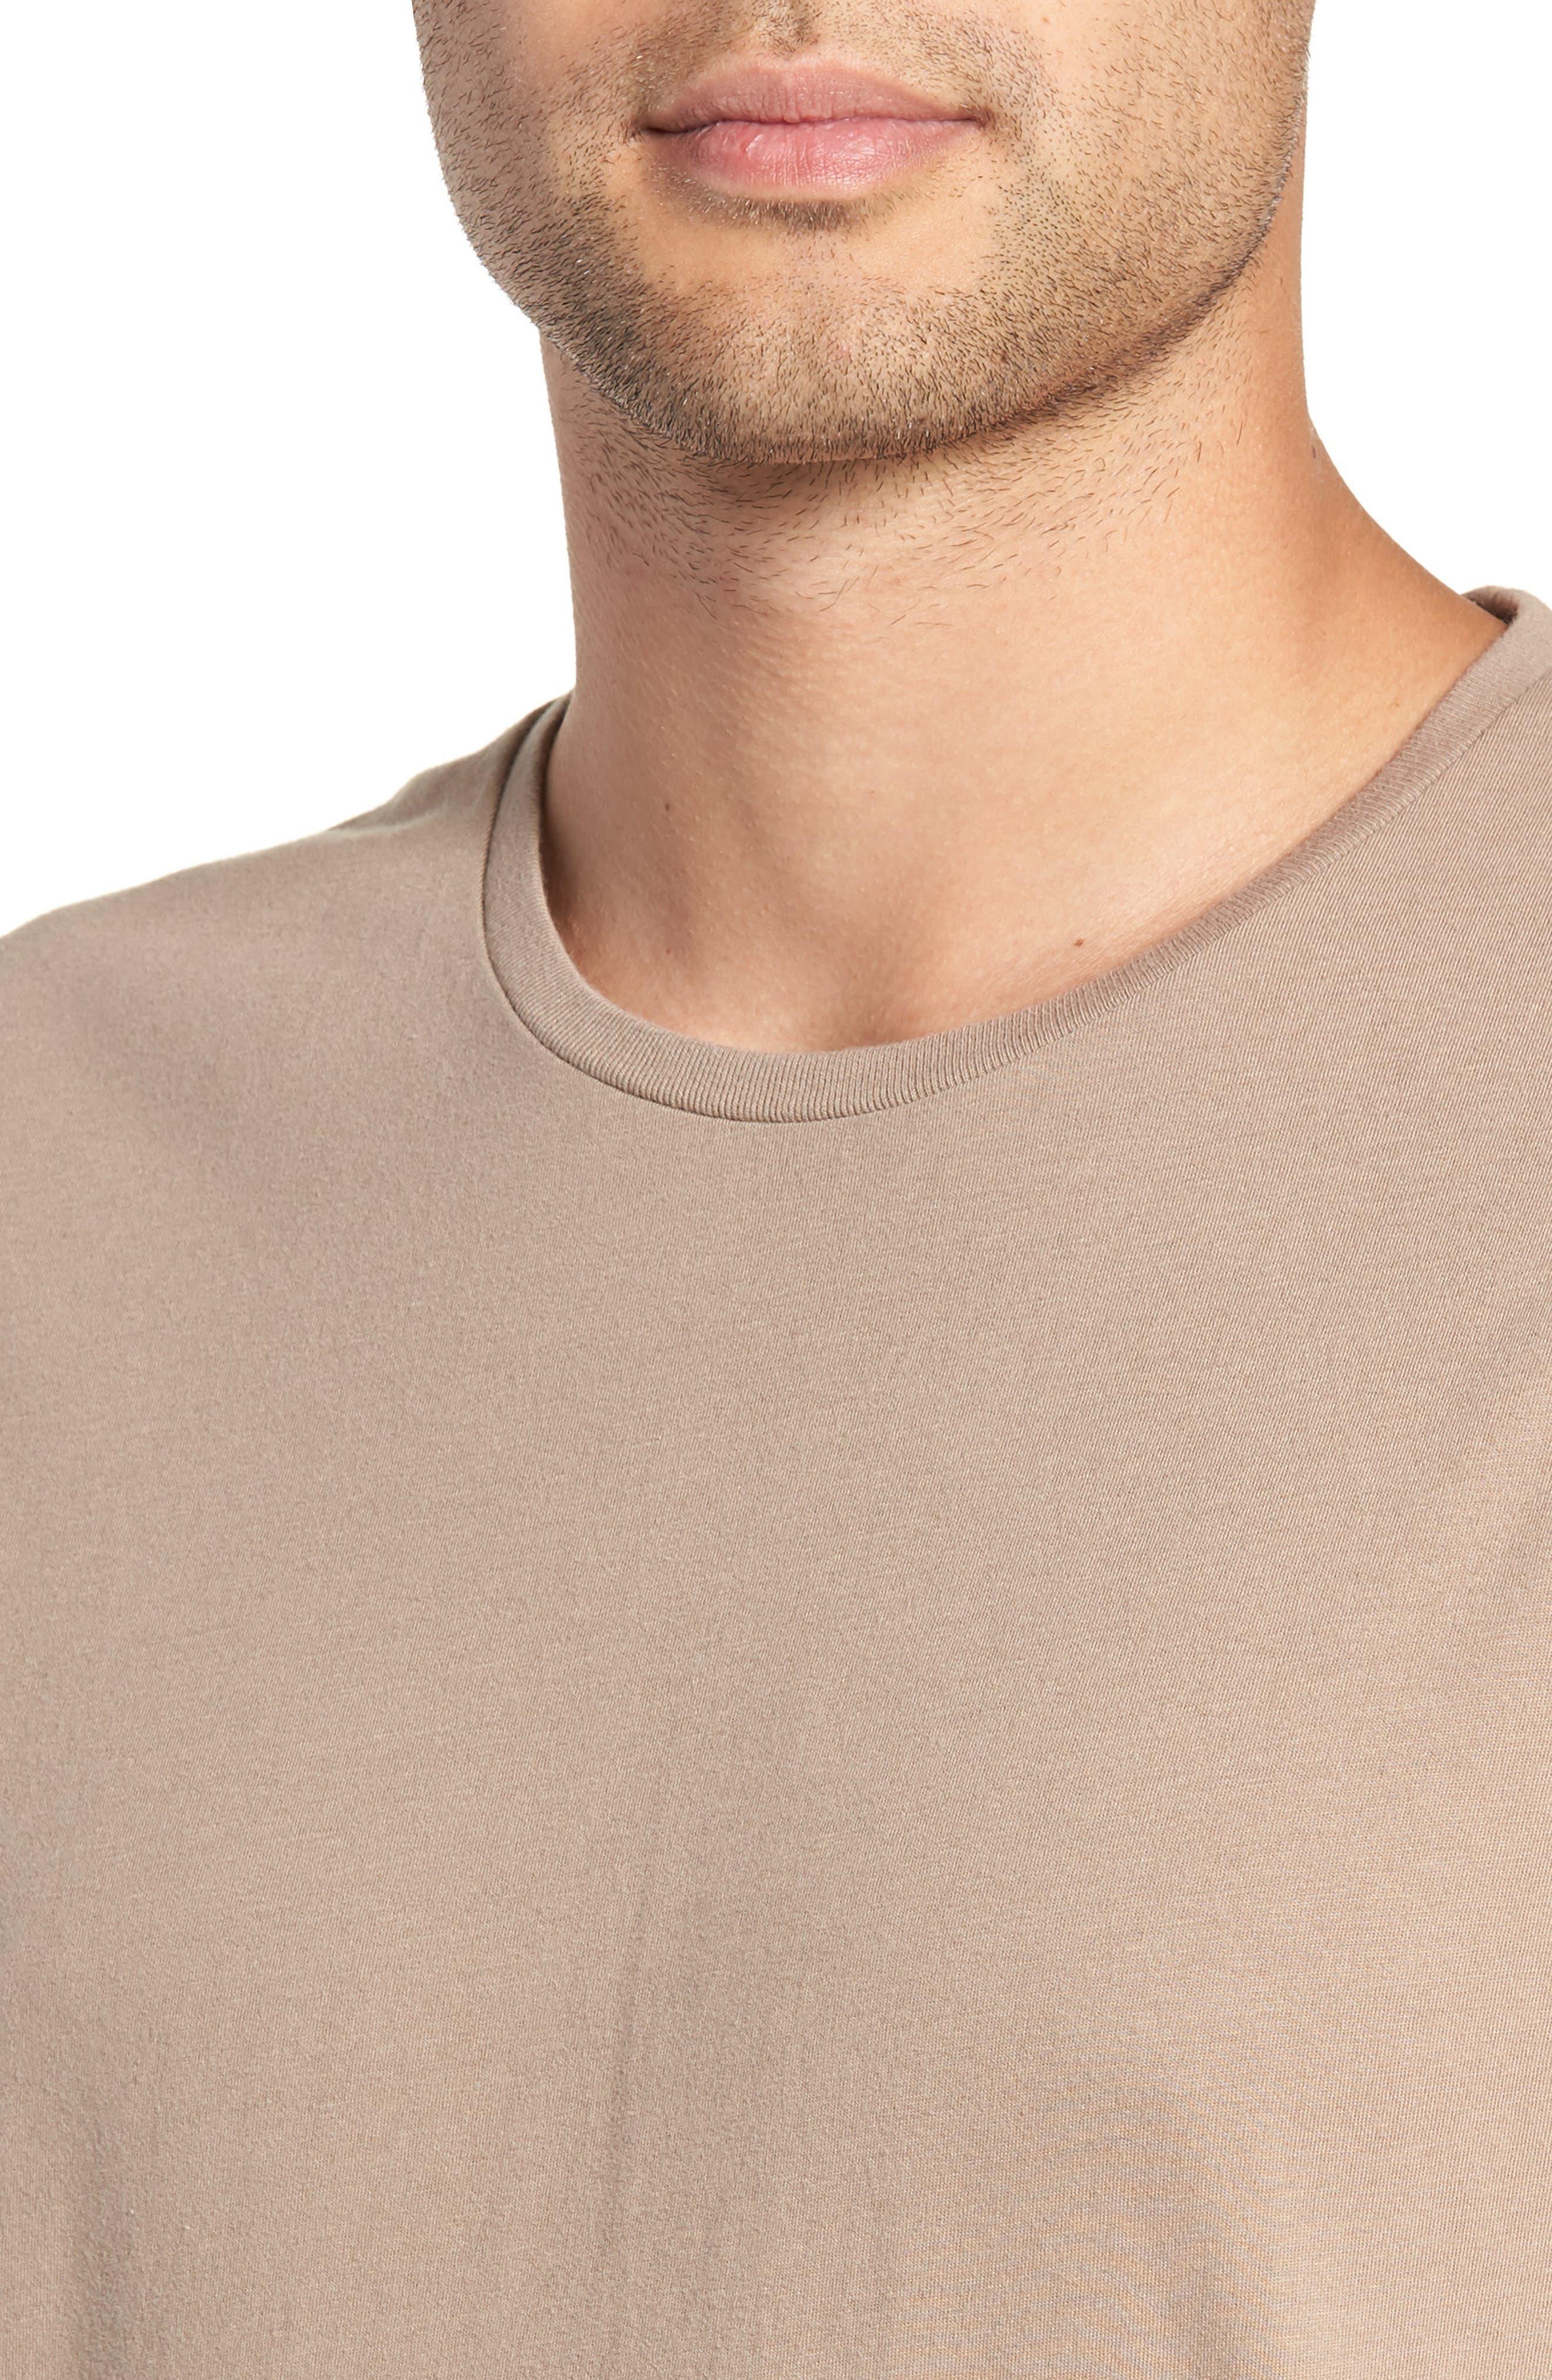 Flintlock T-Shirt,                             Alternate thumbnail 4, color,                             TIMBER